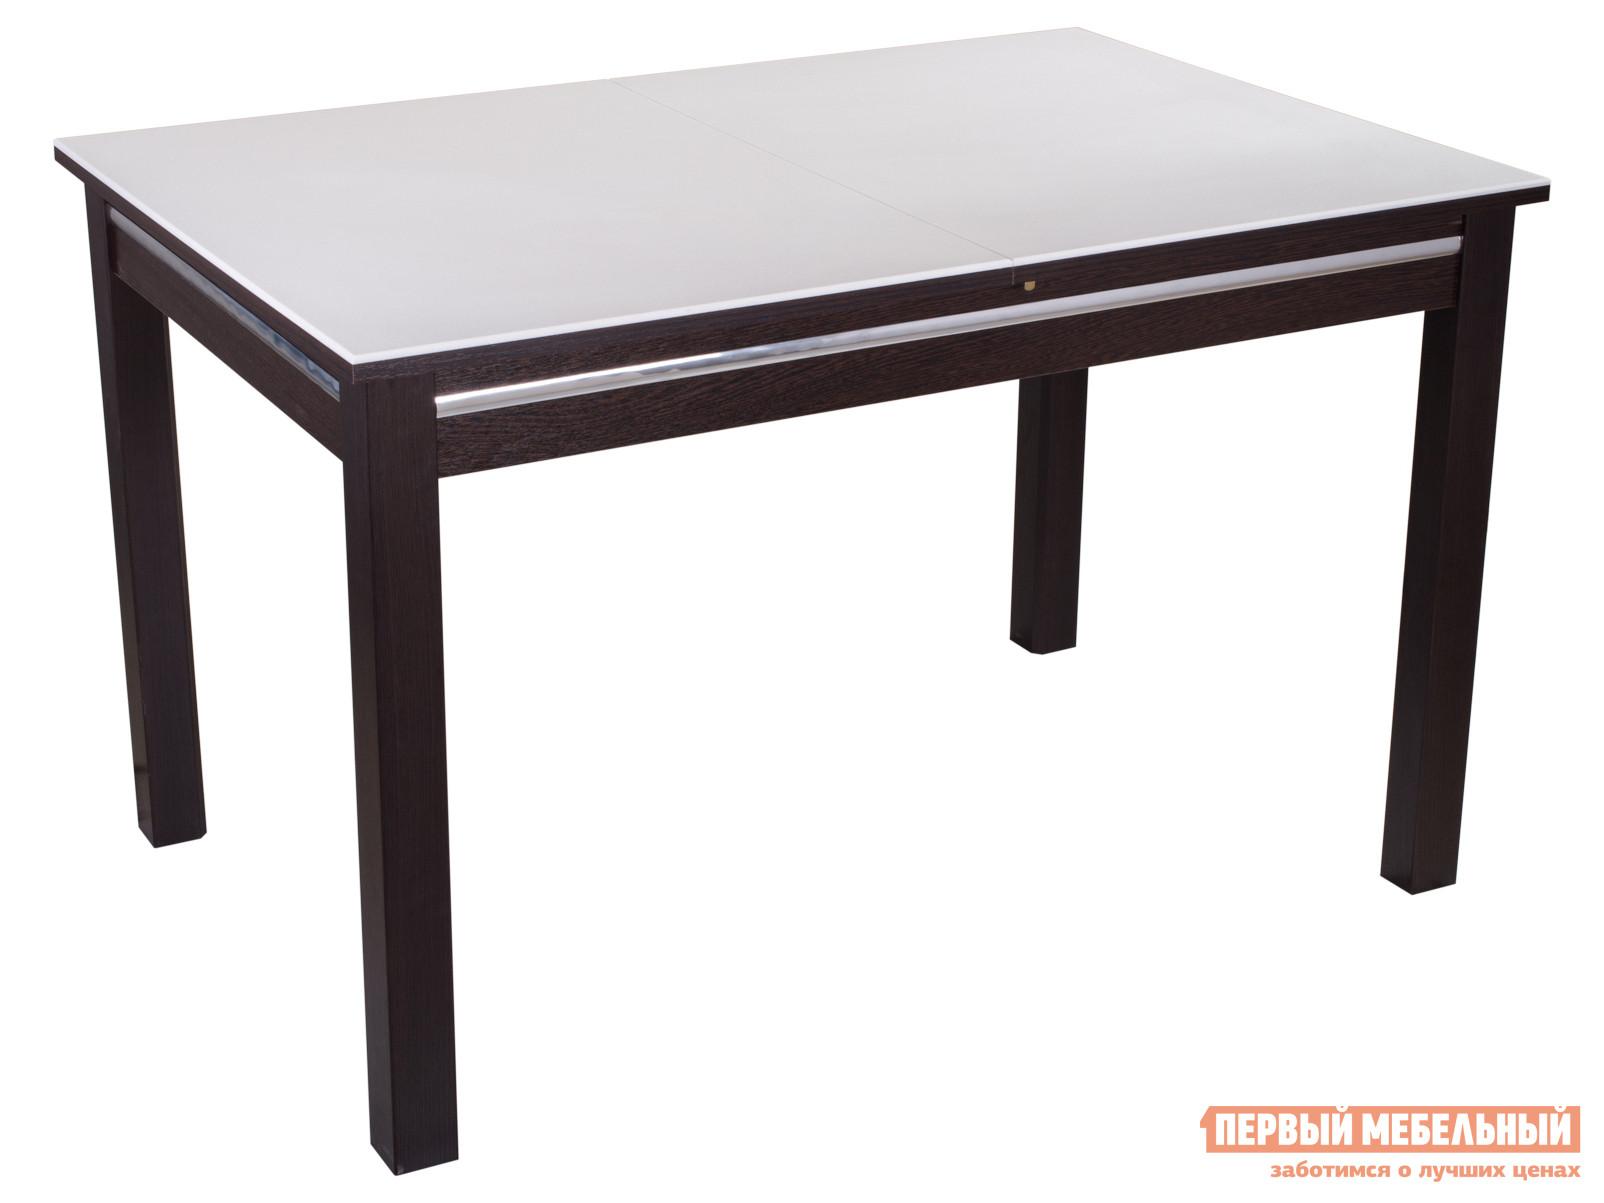 цена на Обеденный стол Домотека Обеденный стол Самба КМ